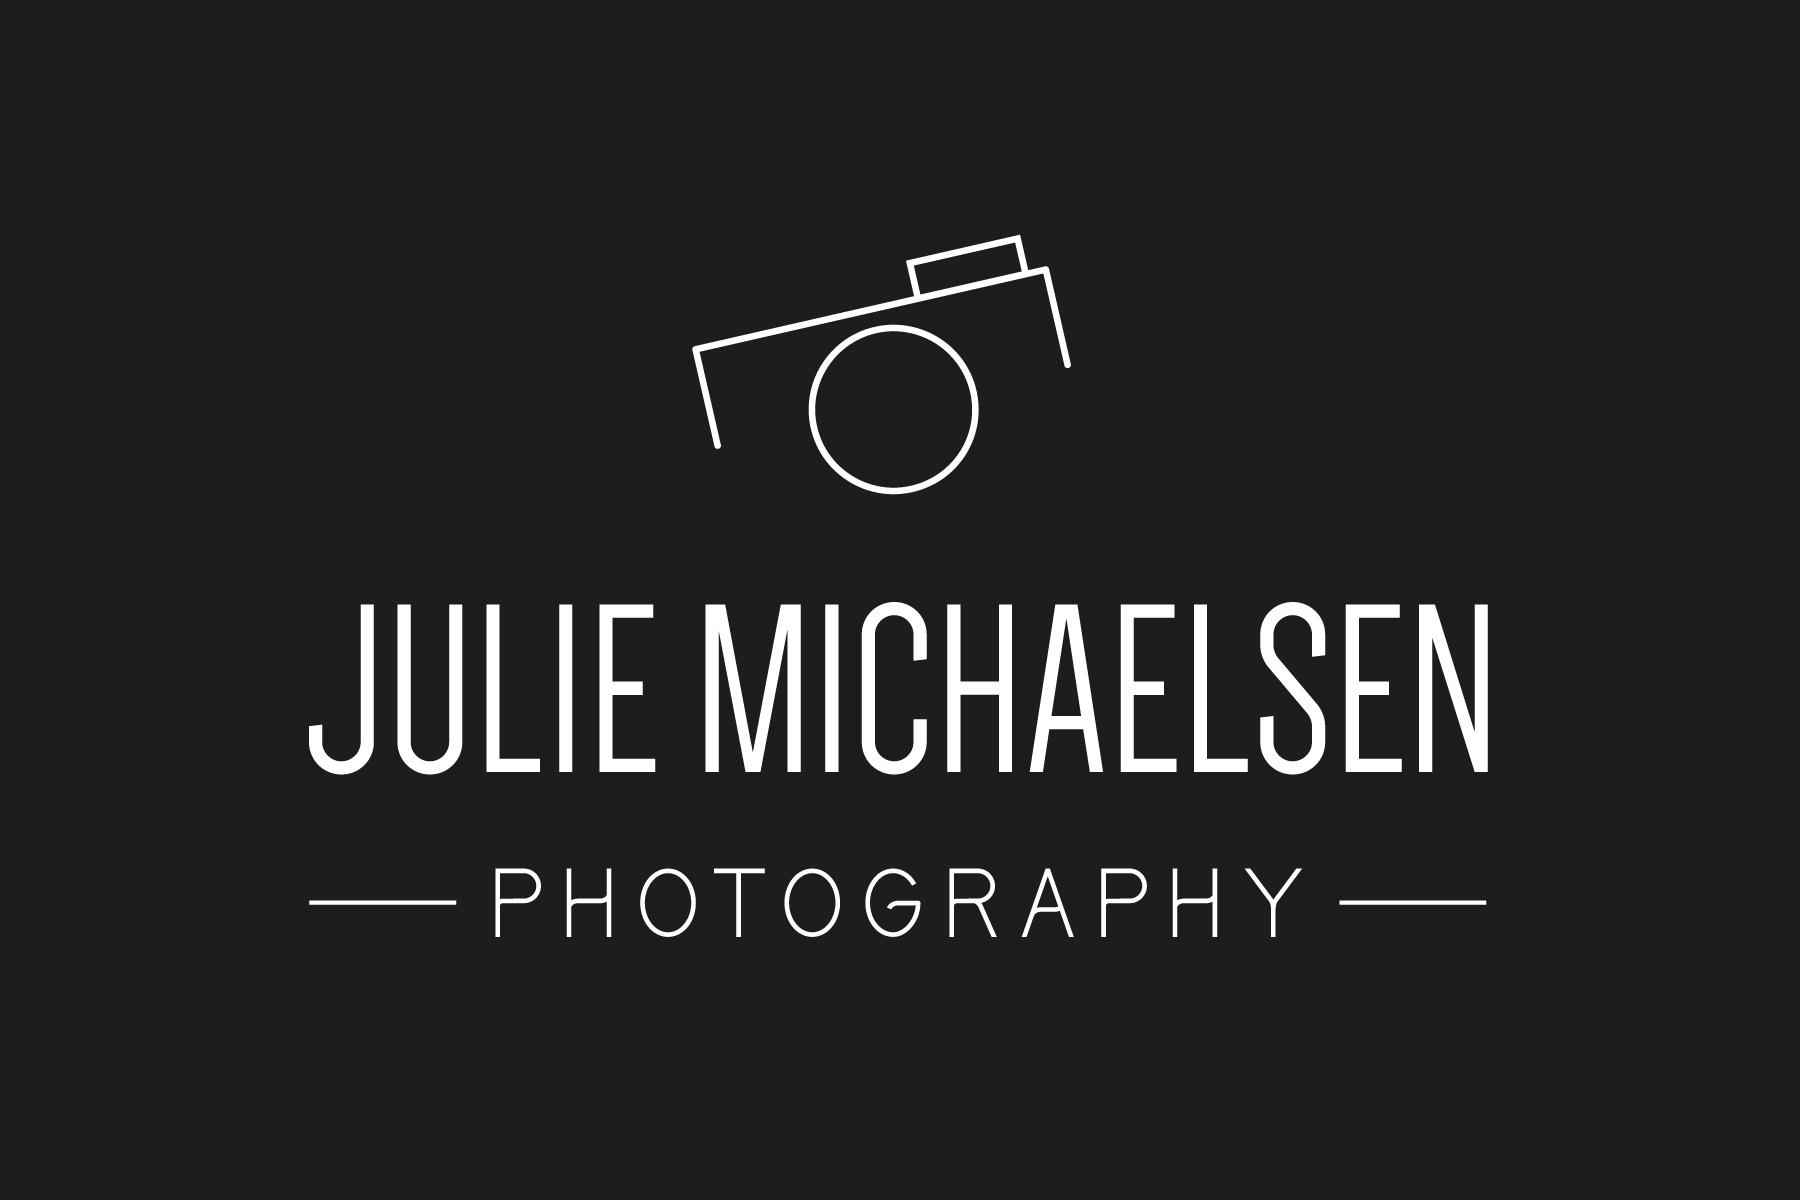 julie-michaelsen-photography-1.jpg